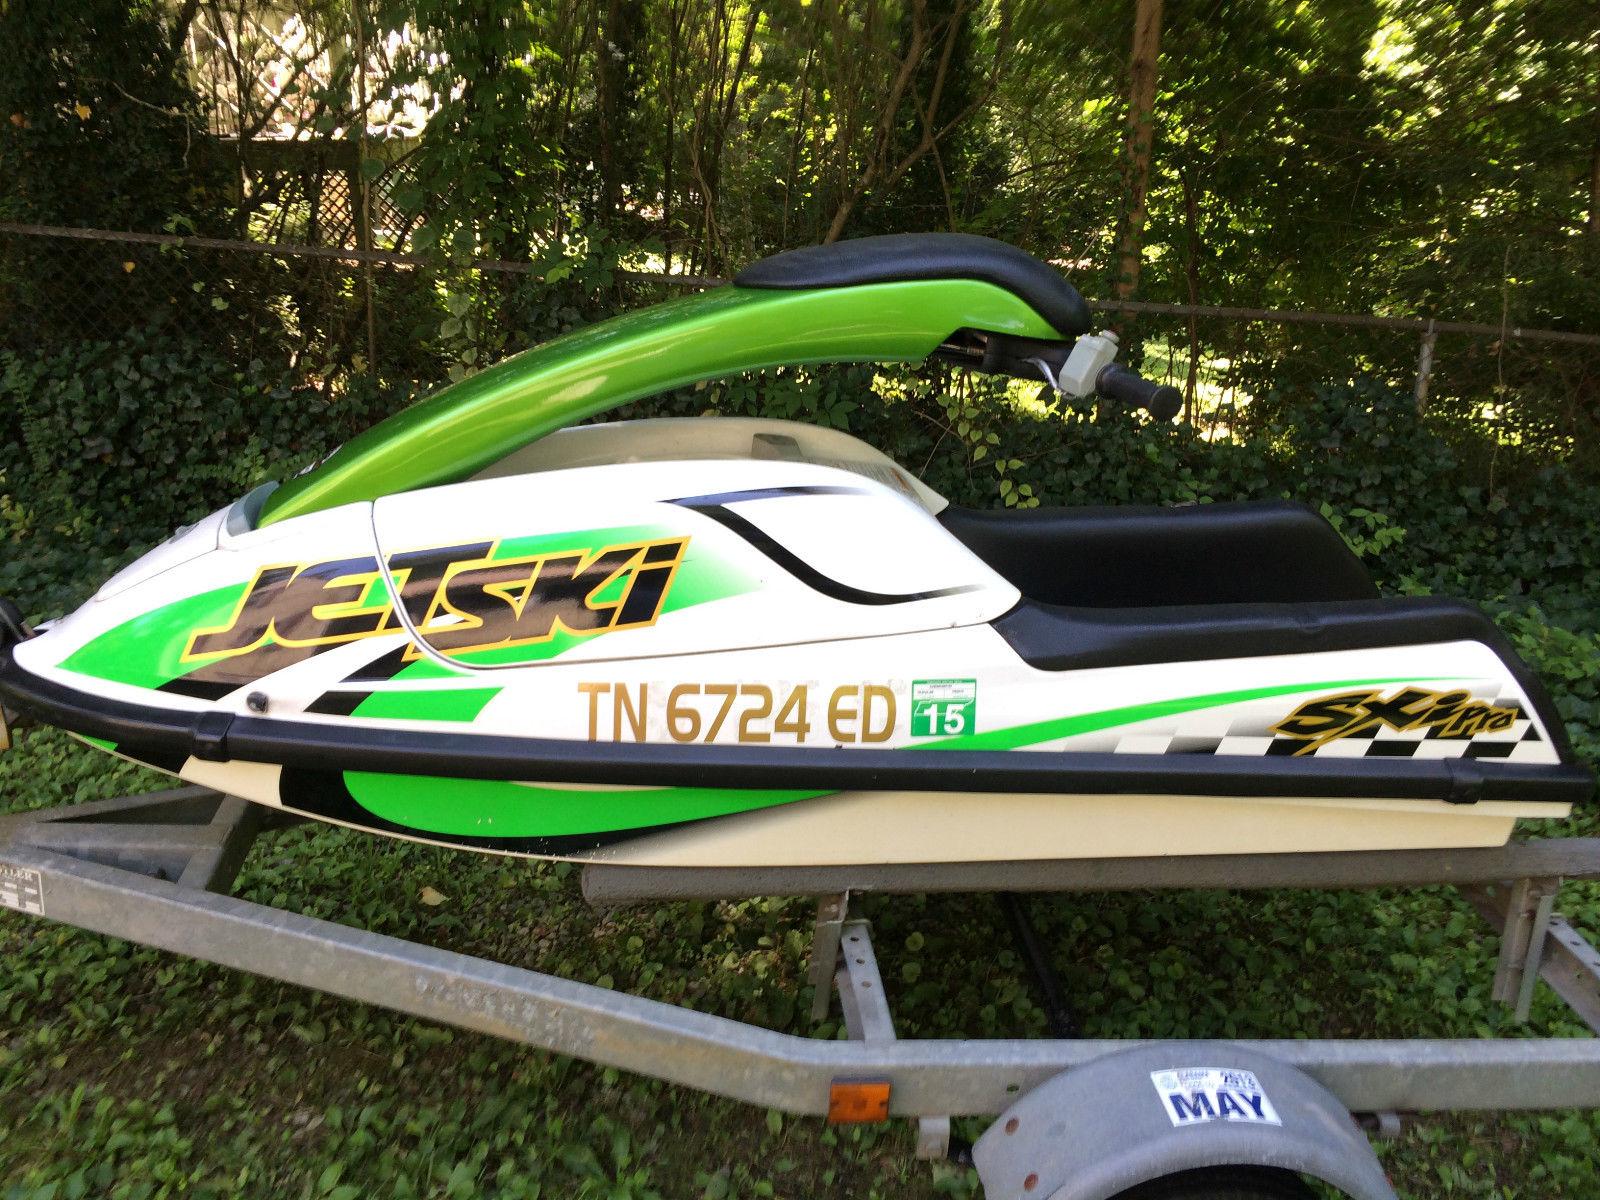 Kawasaki 750 Sxi Pro Boat For Sale From Usa